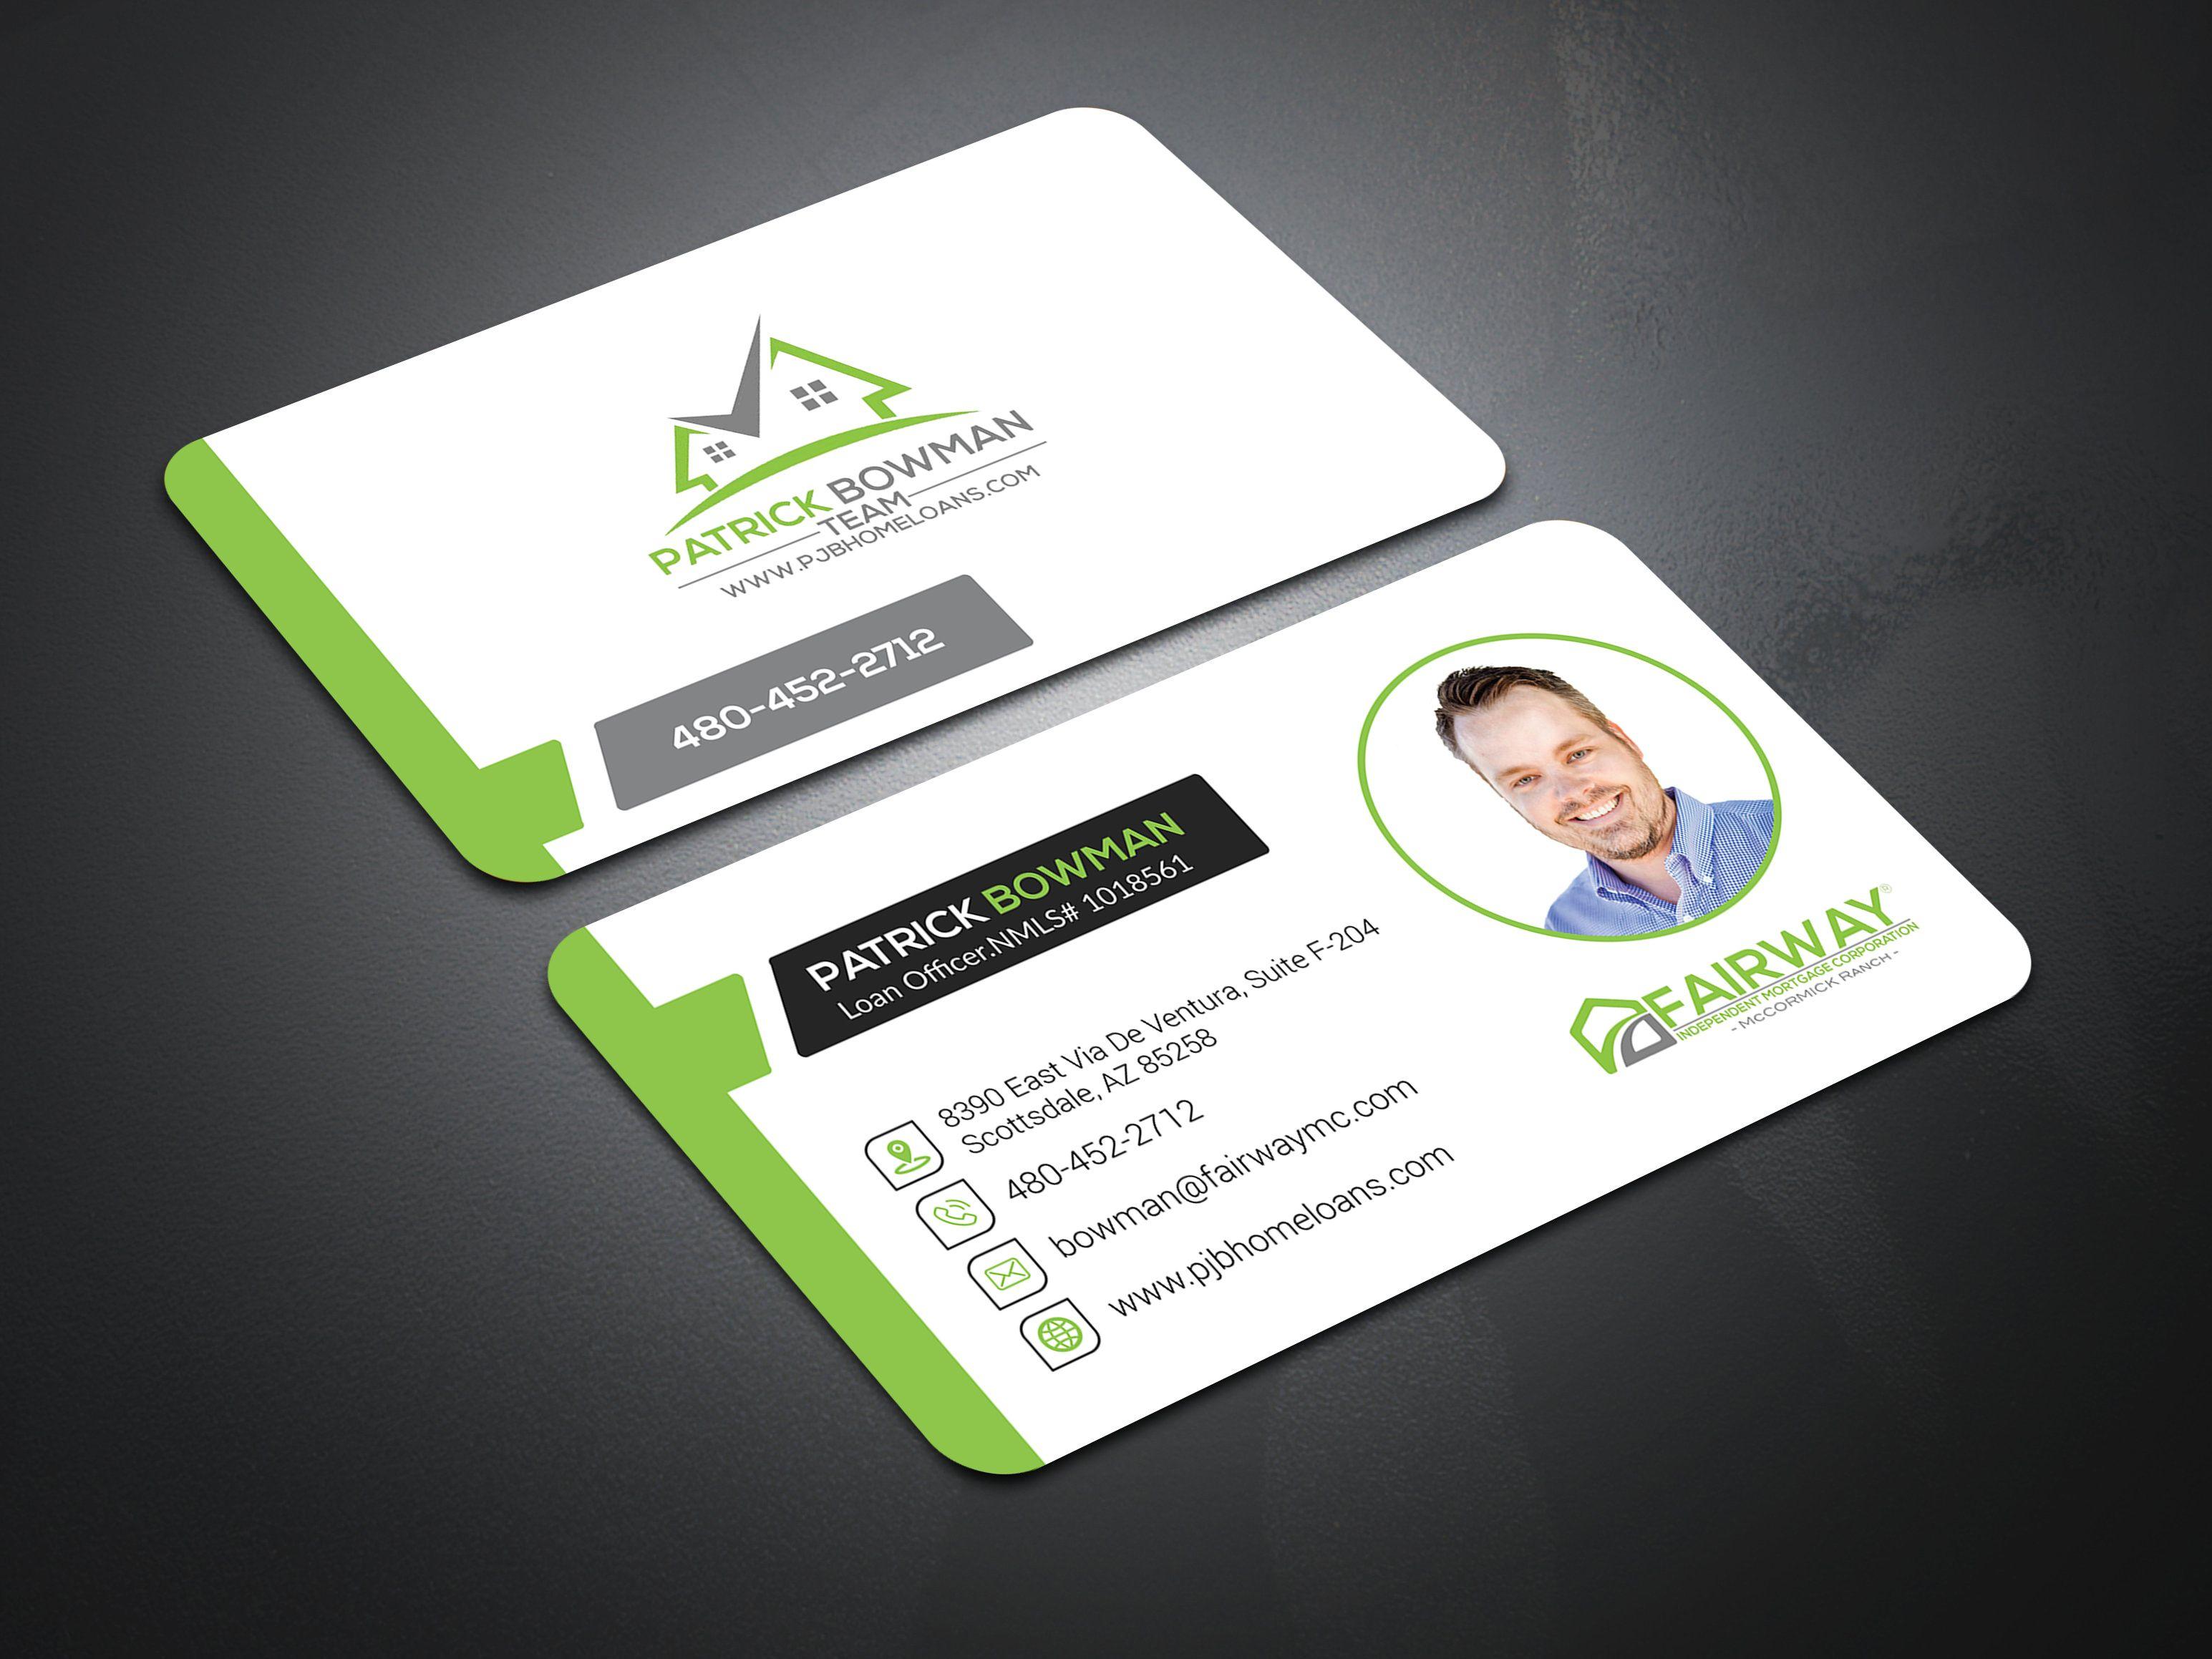 Business Card Design Sample Business Card Design Card Design Cards